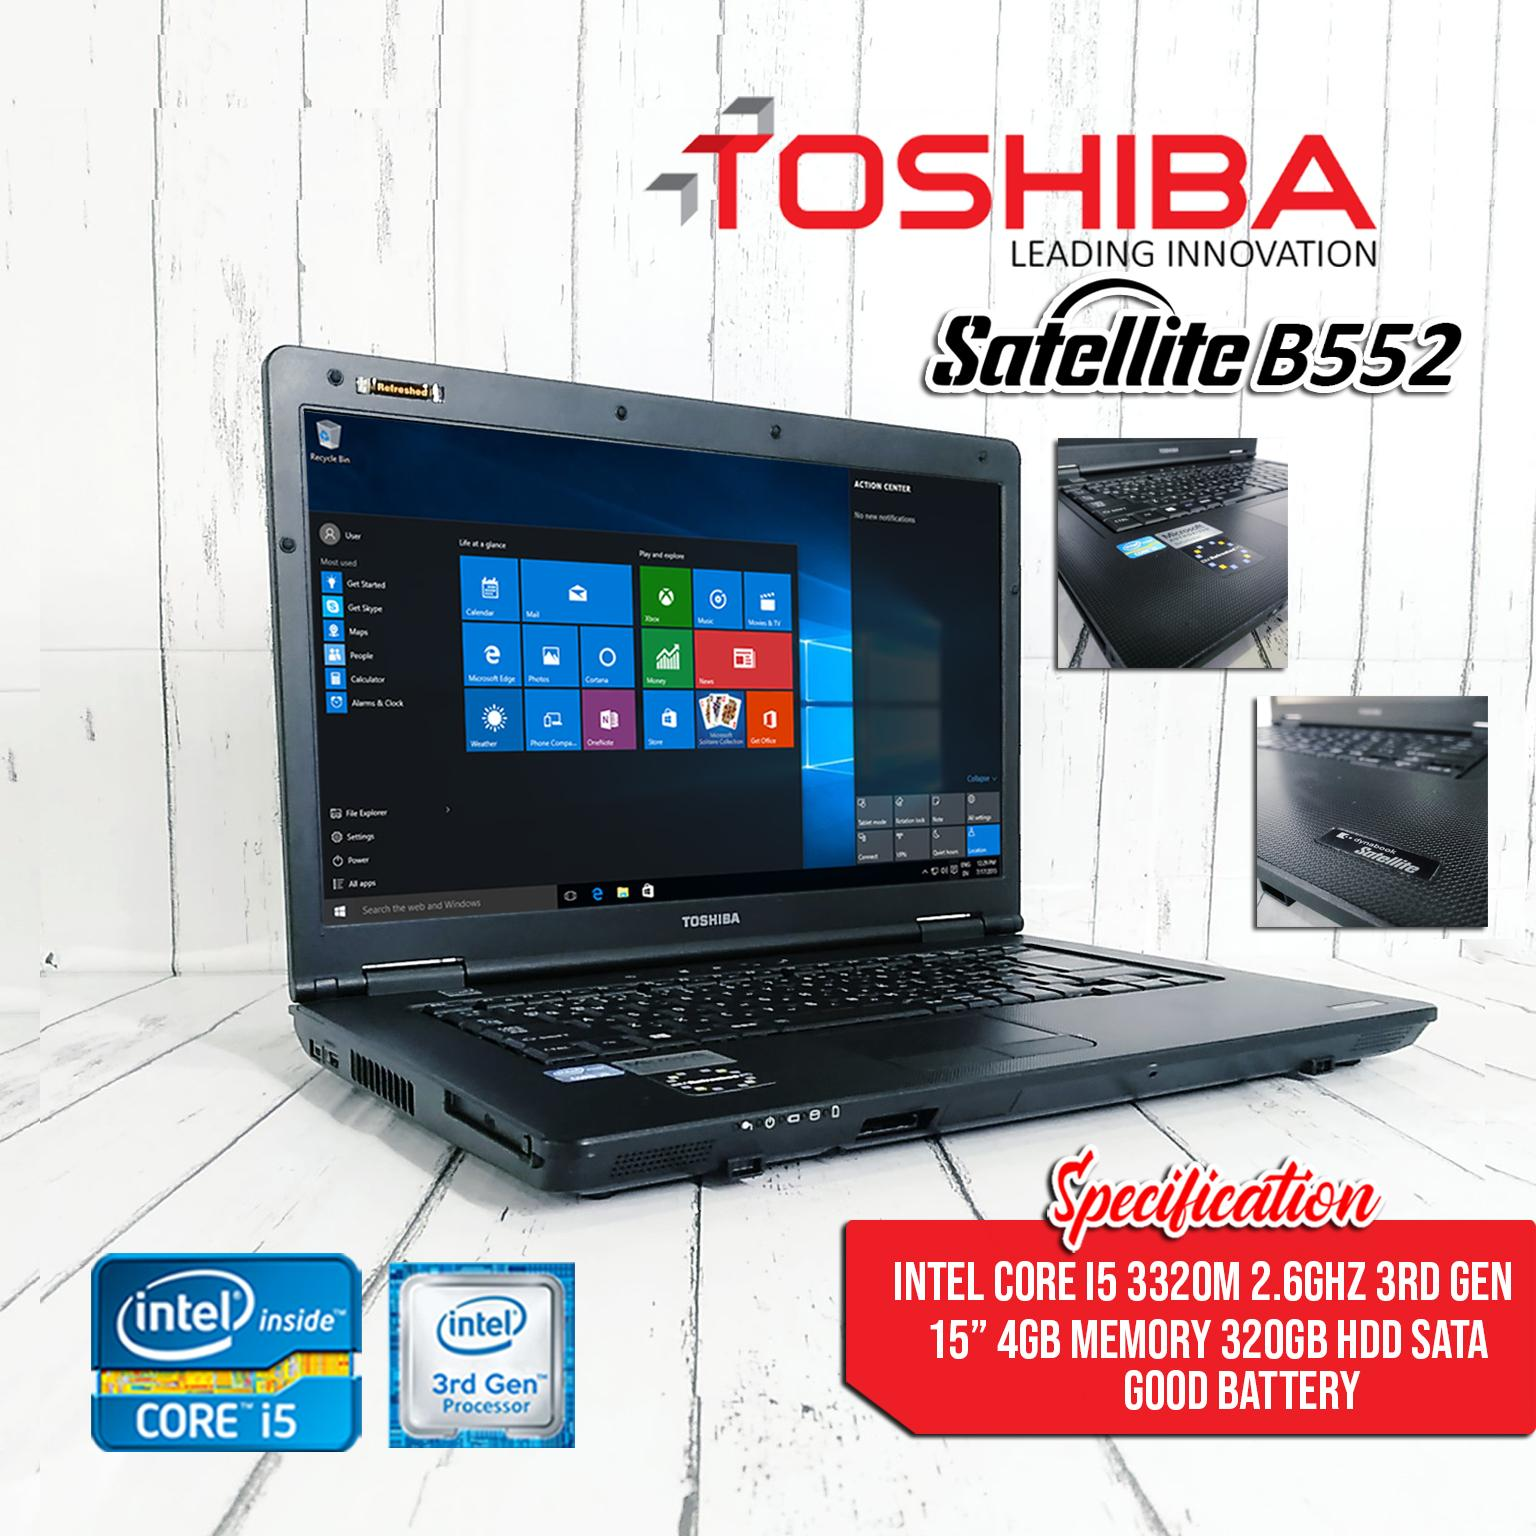 LAPTOP Toshiba Satelite B552 core i5 3320 2 6ghz (3rd gen) 4GB 320GB /  LAPTOP on sale / student / online job [NO WINDOWS/OS]